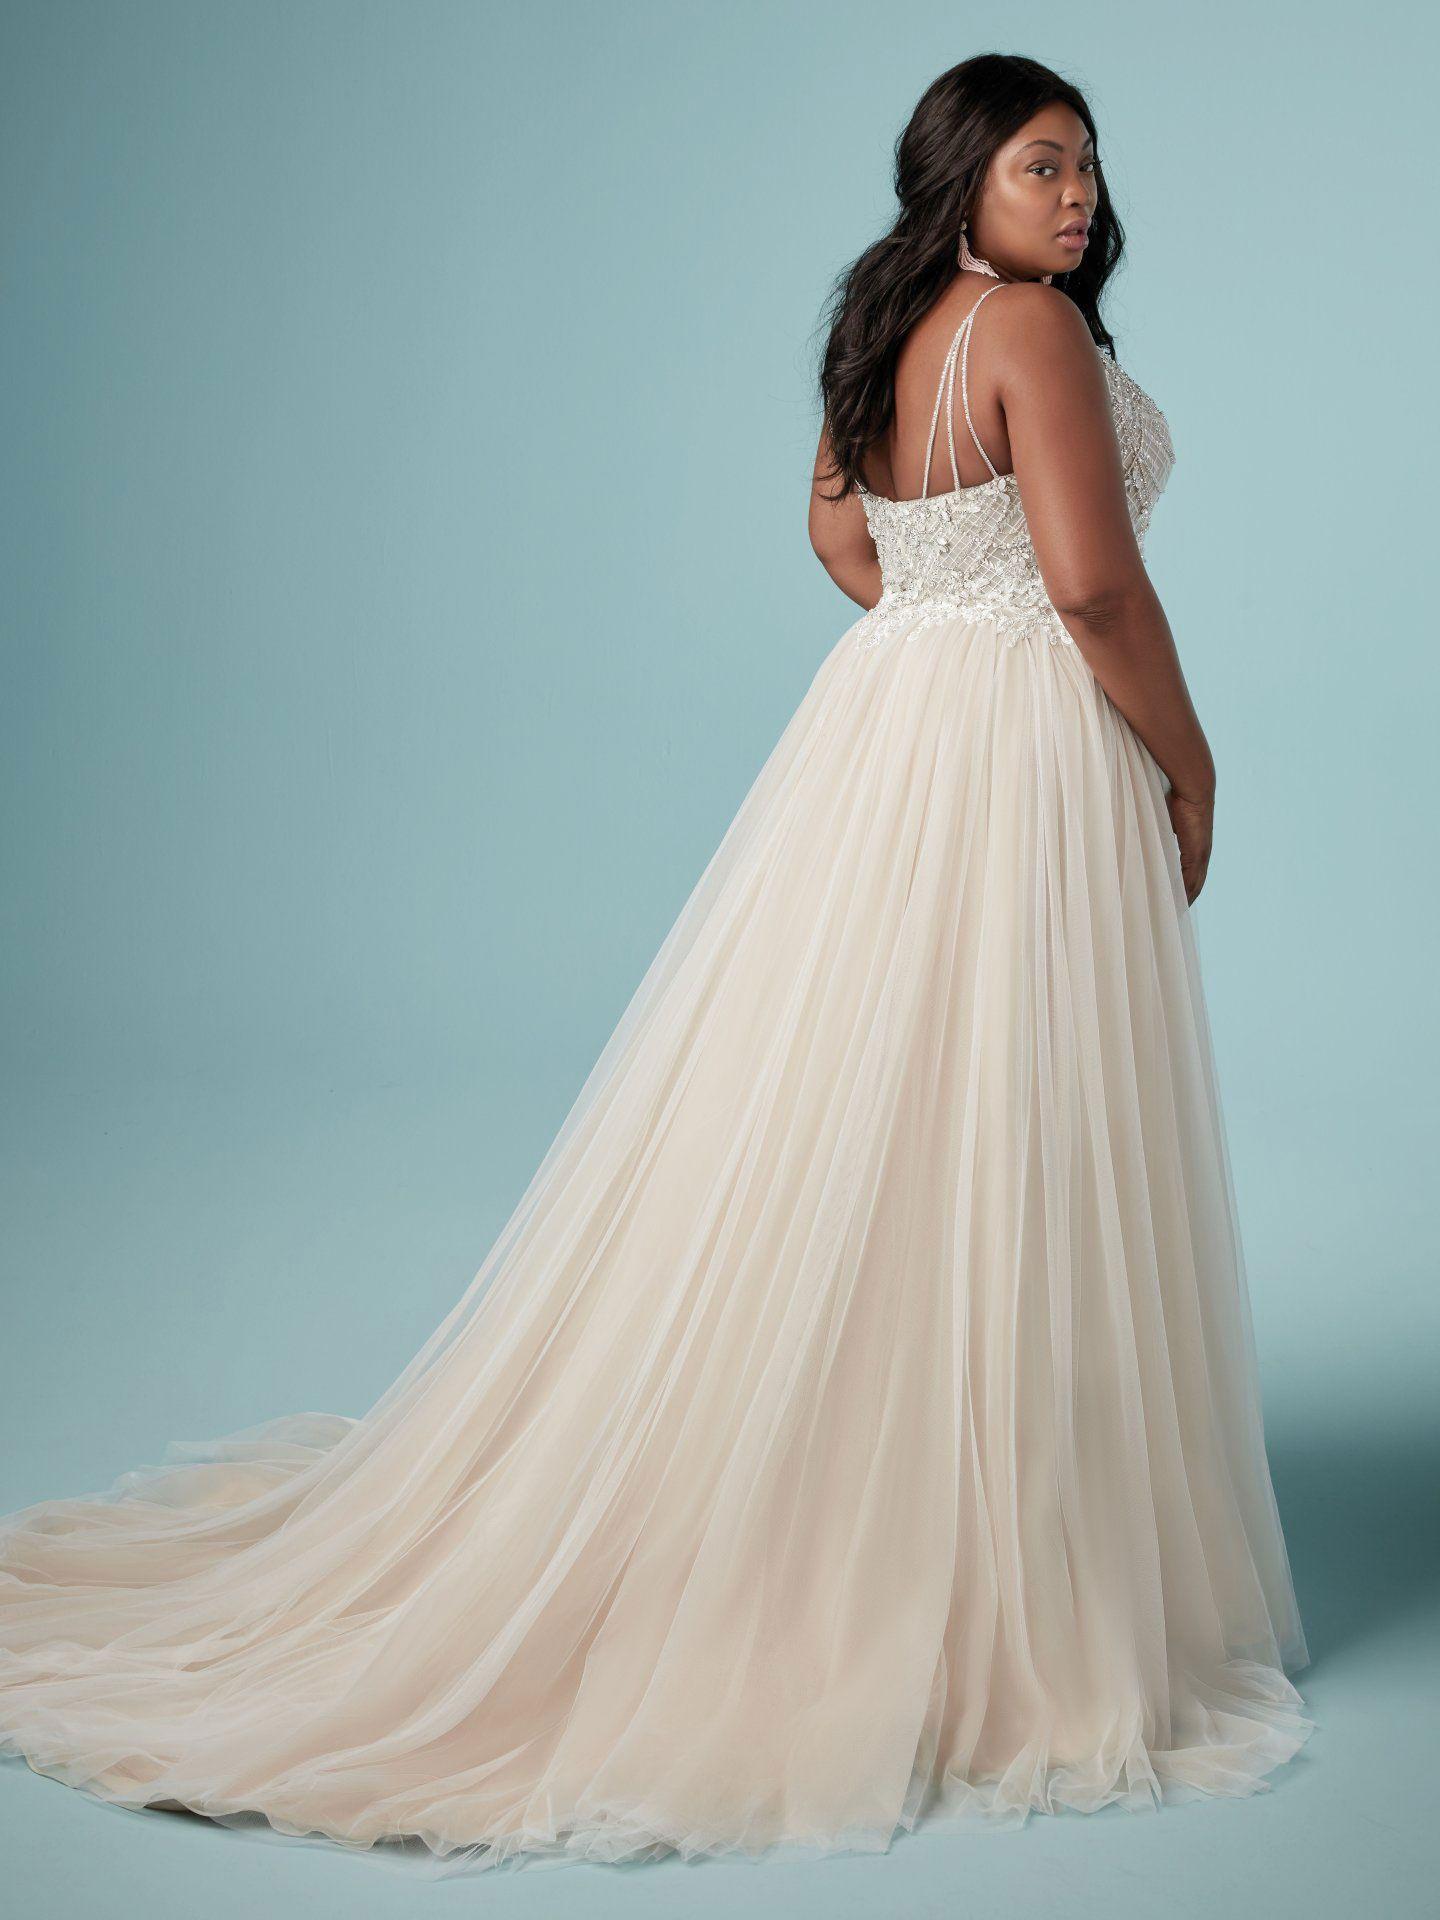 Maggie Sottero Matilda Lynette Plus Size A Line Wedding Dress Wedding Dresses Sydney Plus Wedding Dresses Wedding Dresses [ 1920 x 1440 Pixel ]